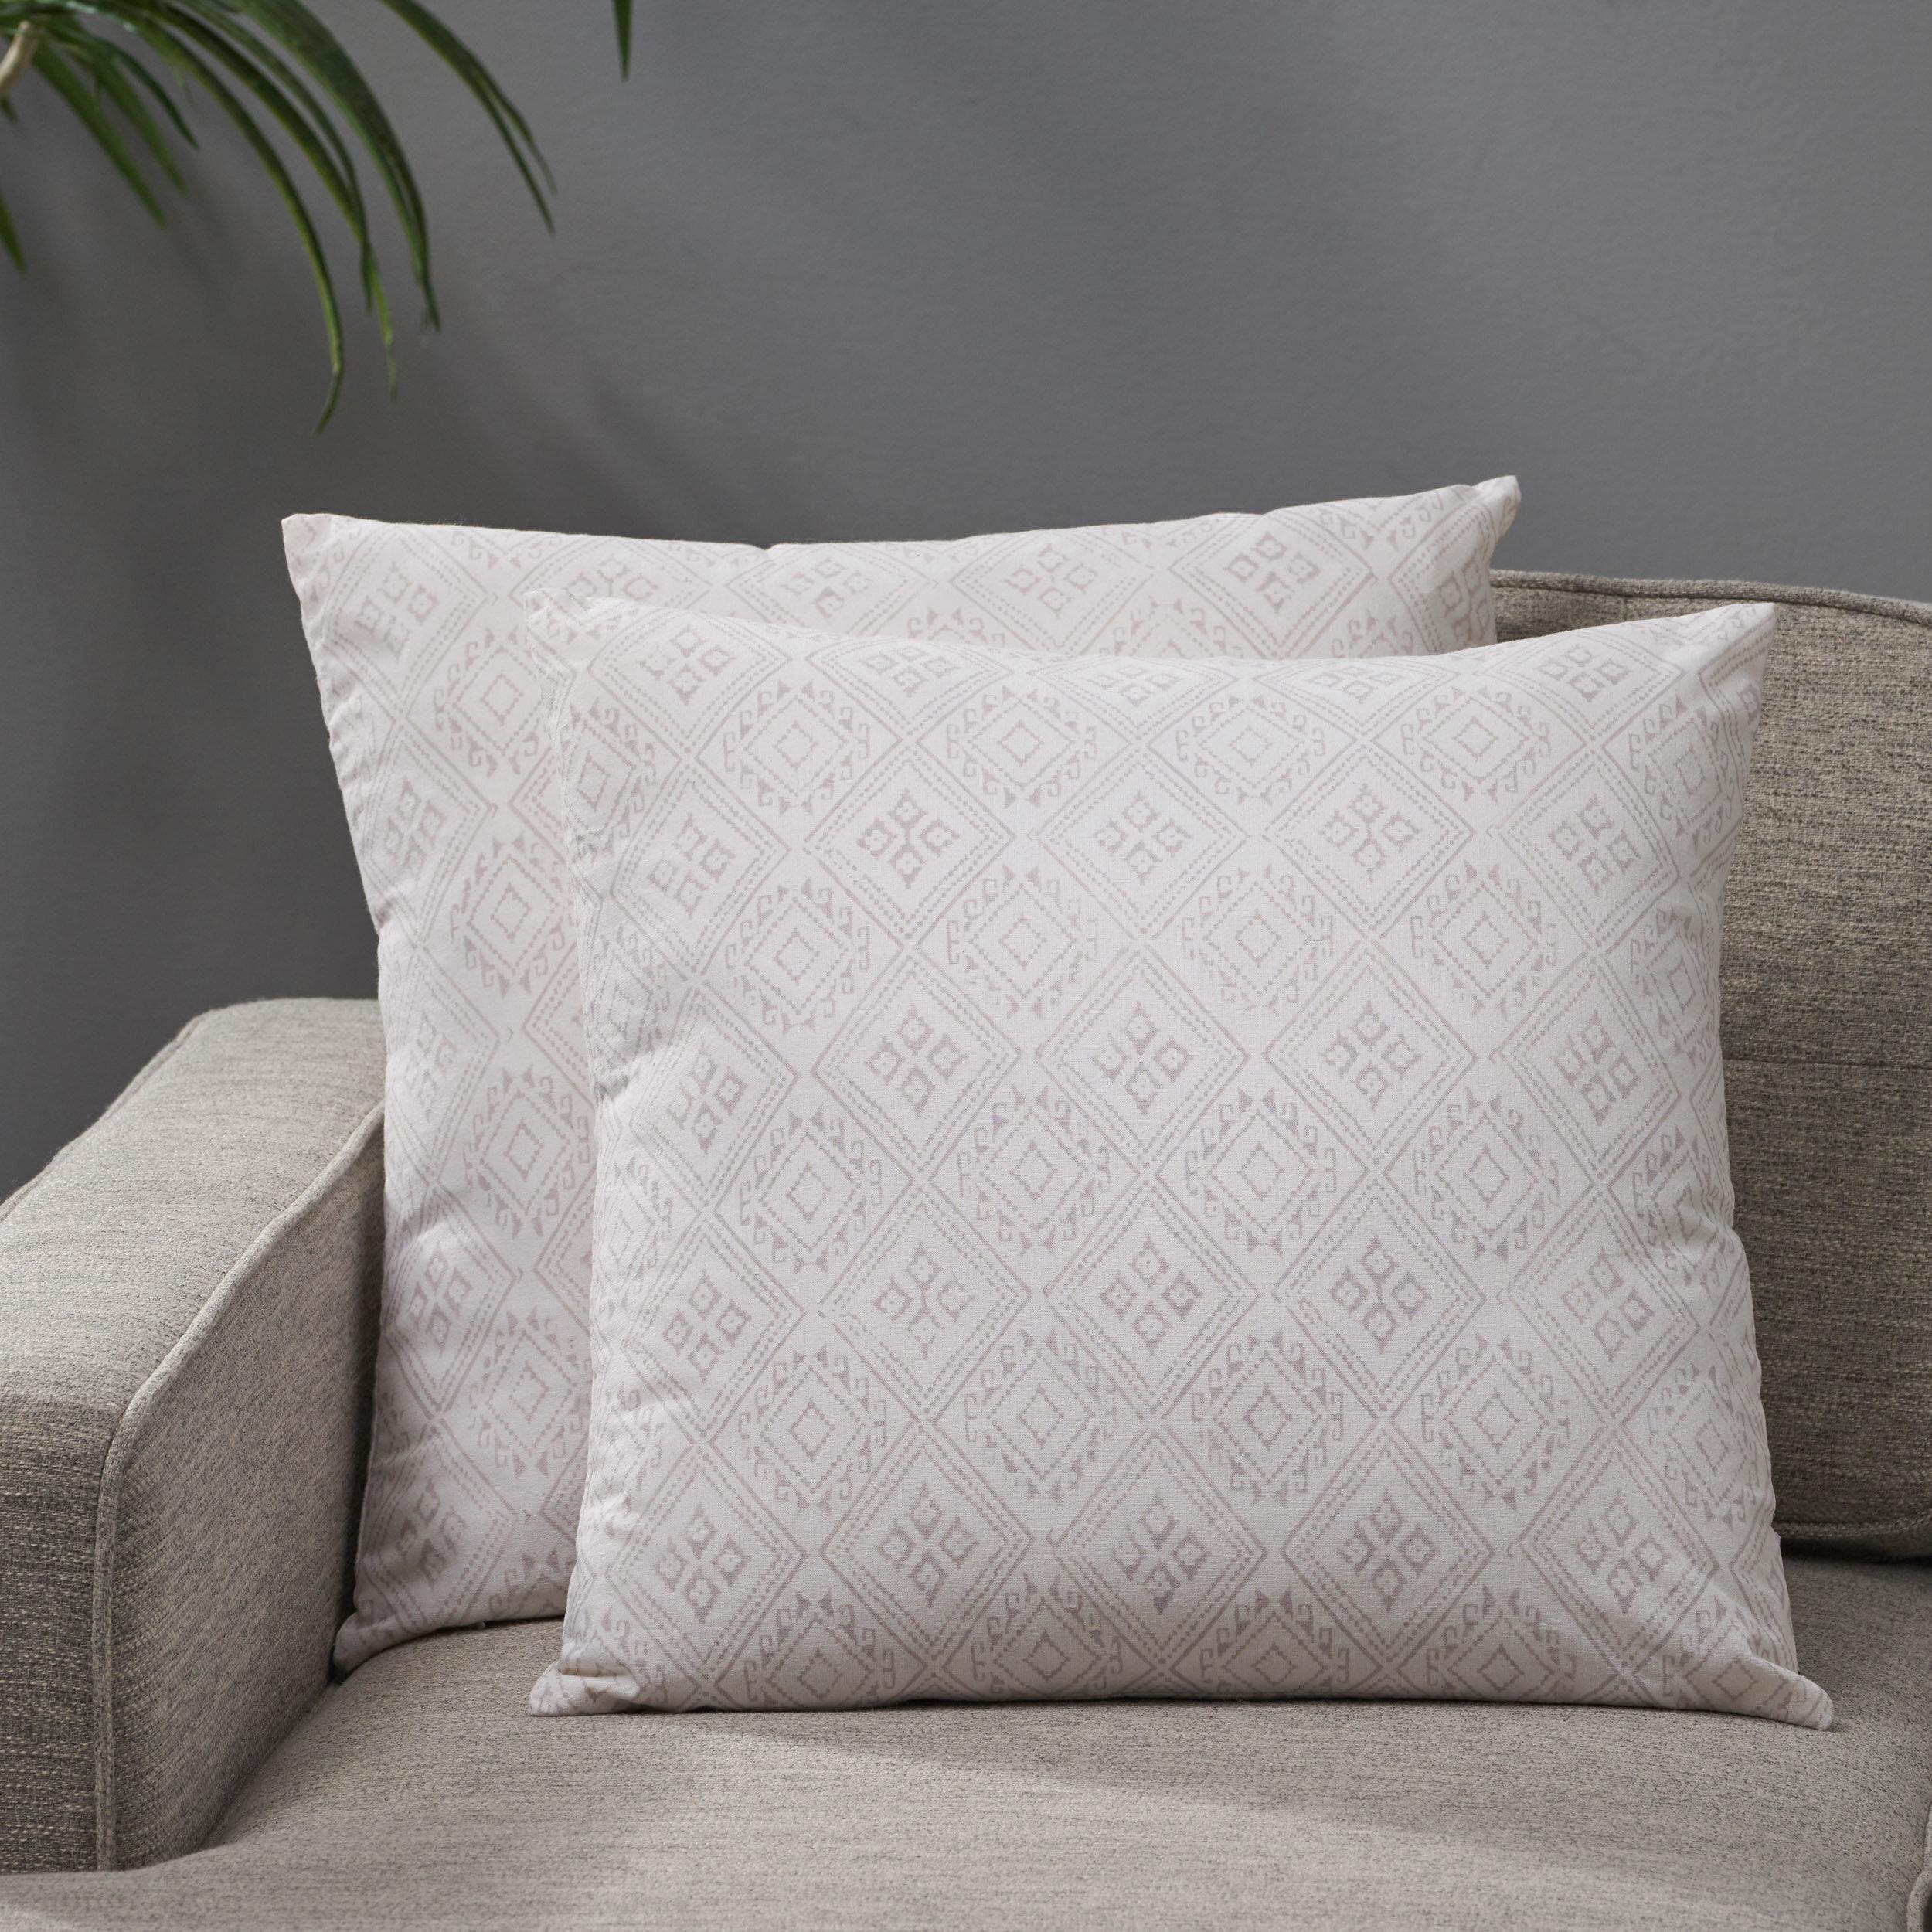 Dakota Fields Nailwell Cotton Geometric 18 Throw Pillow Cover Wayfair